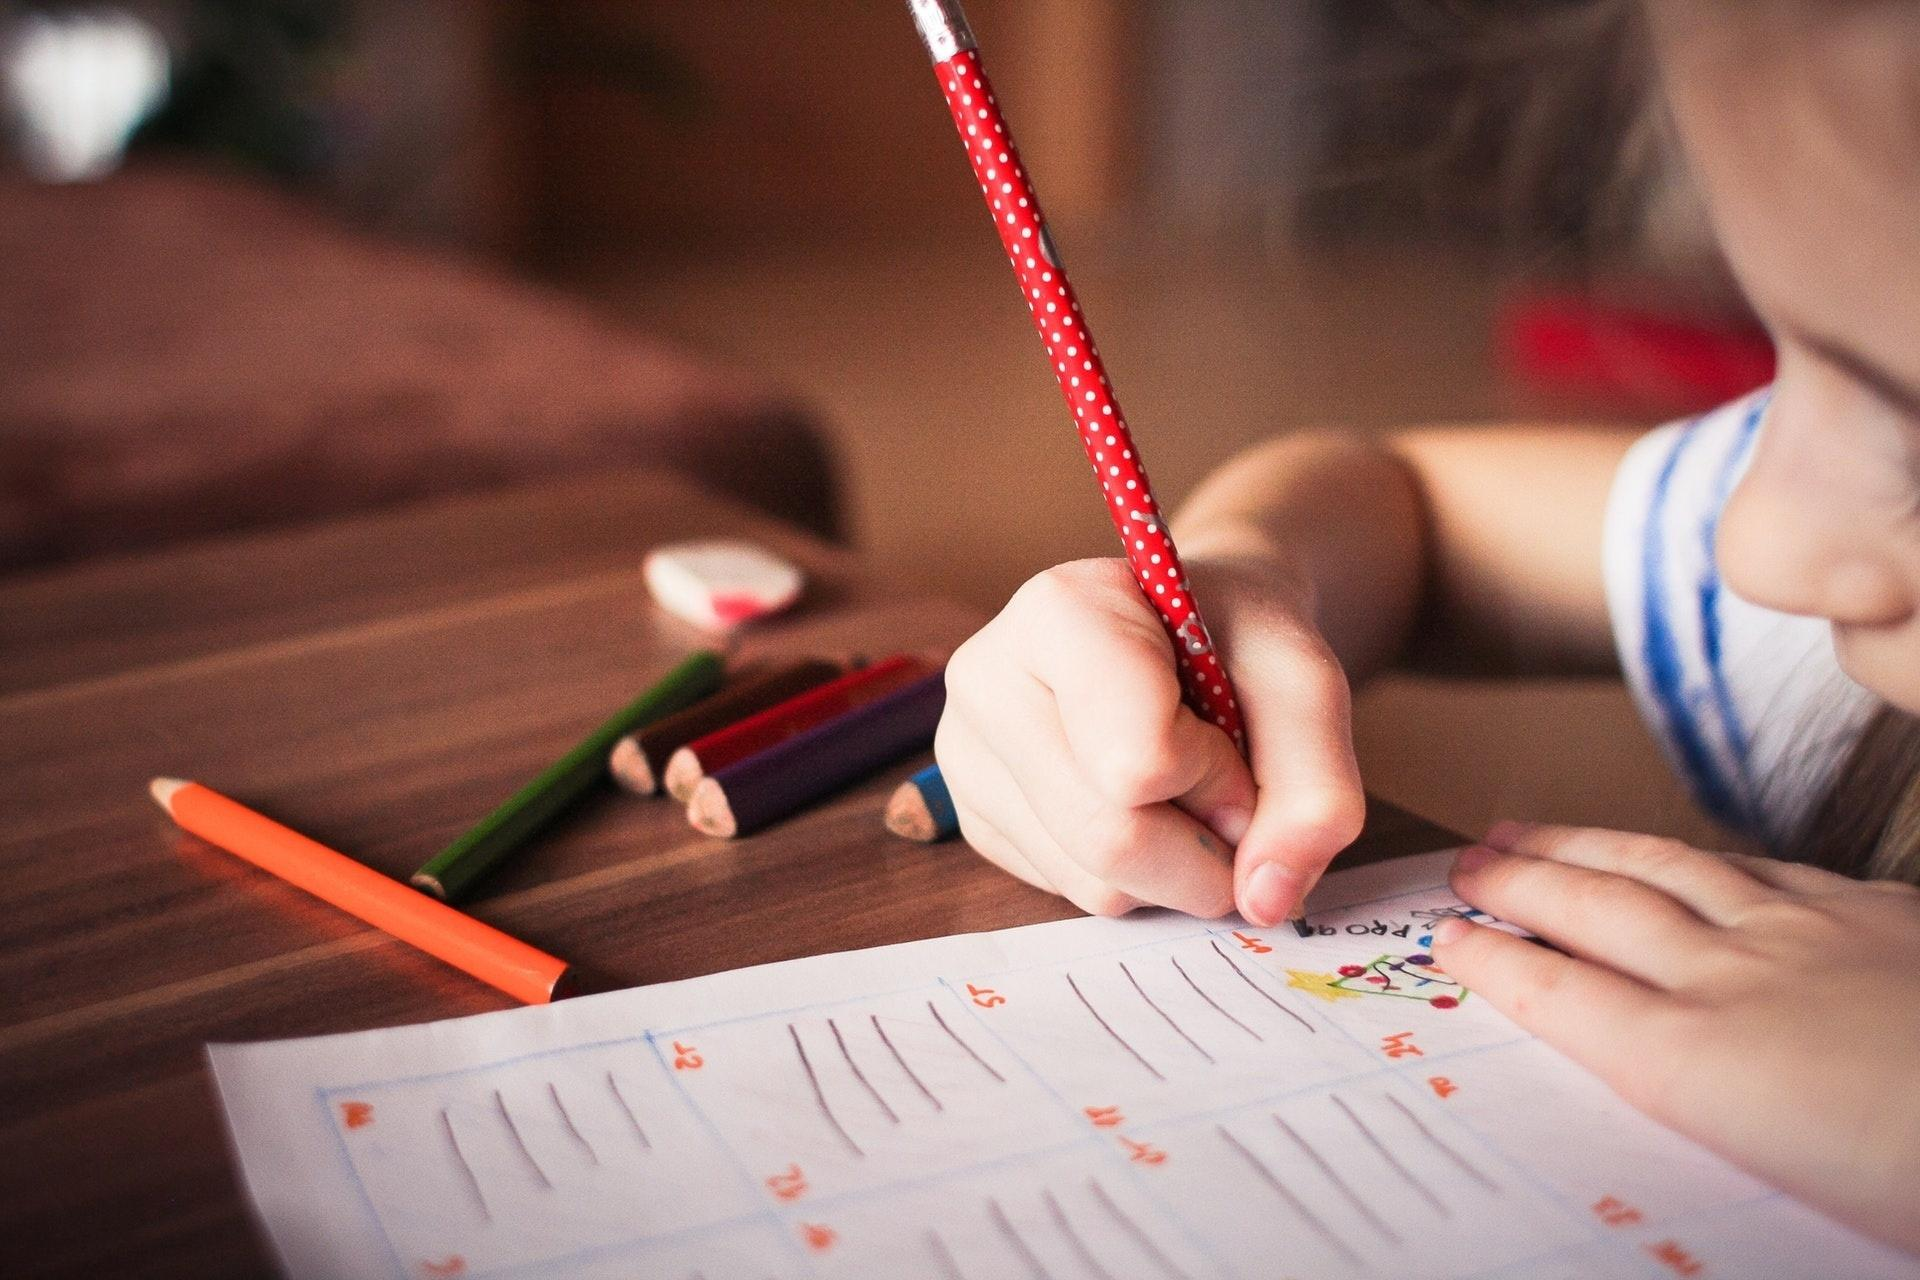 Projeto de homeschooling propõe 14 regras que pais devem cumprir